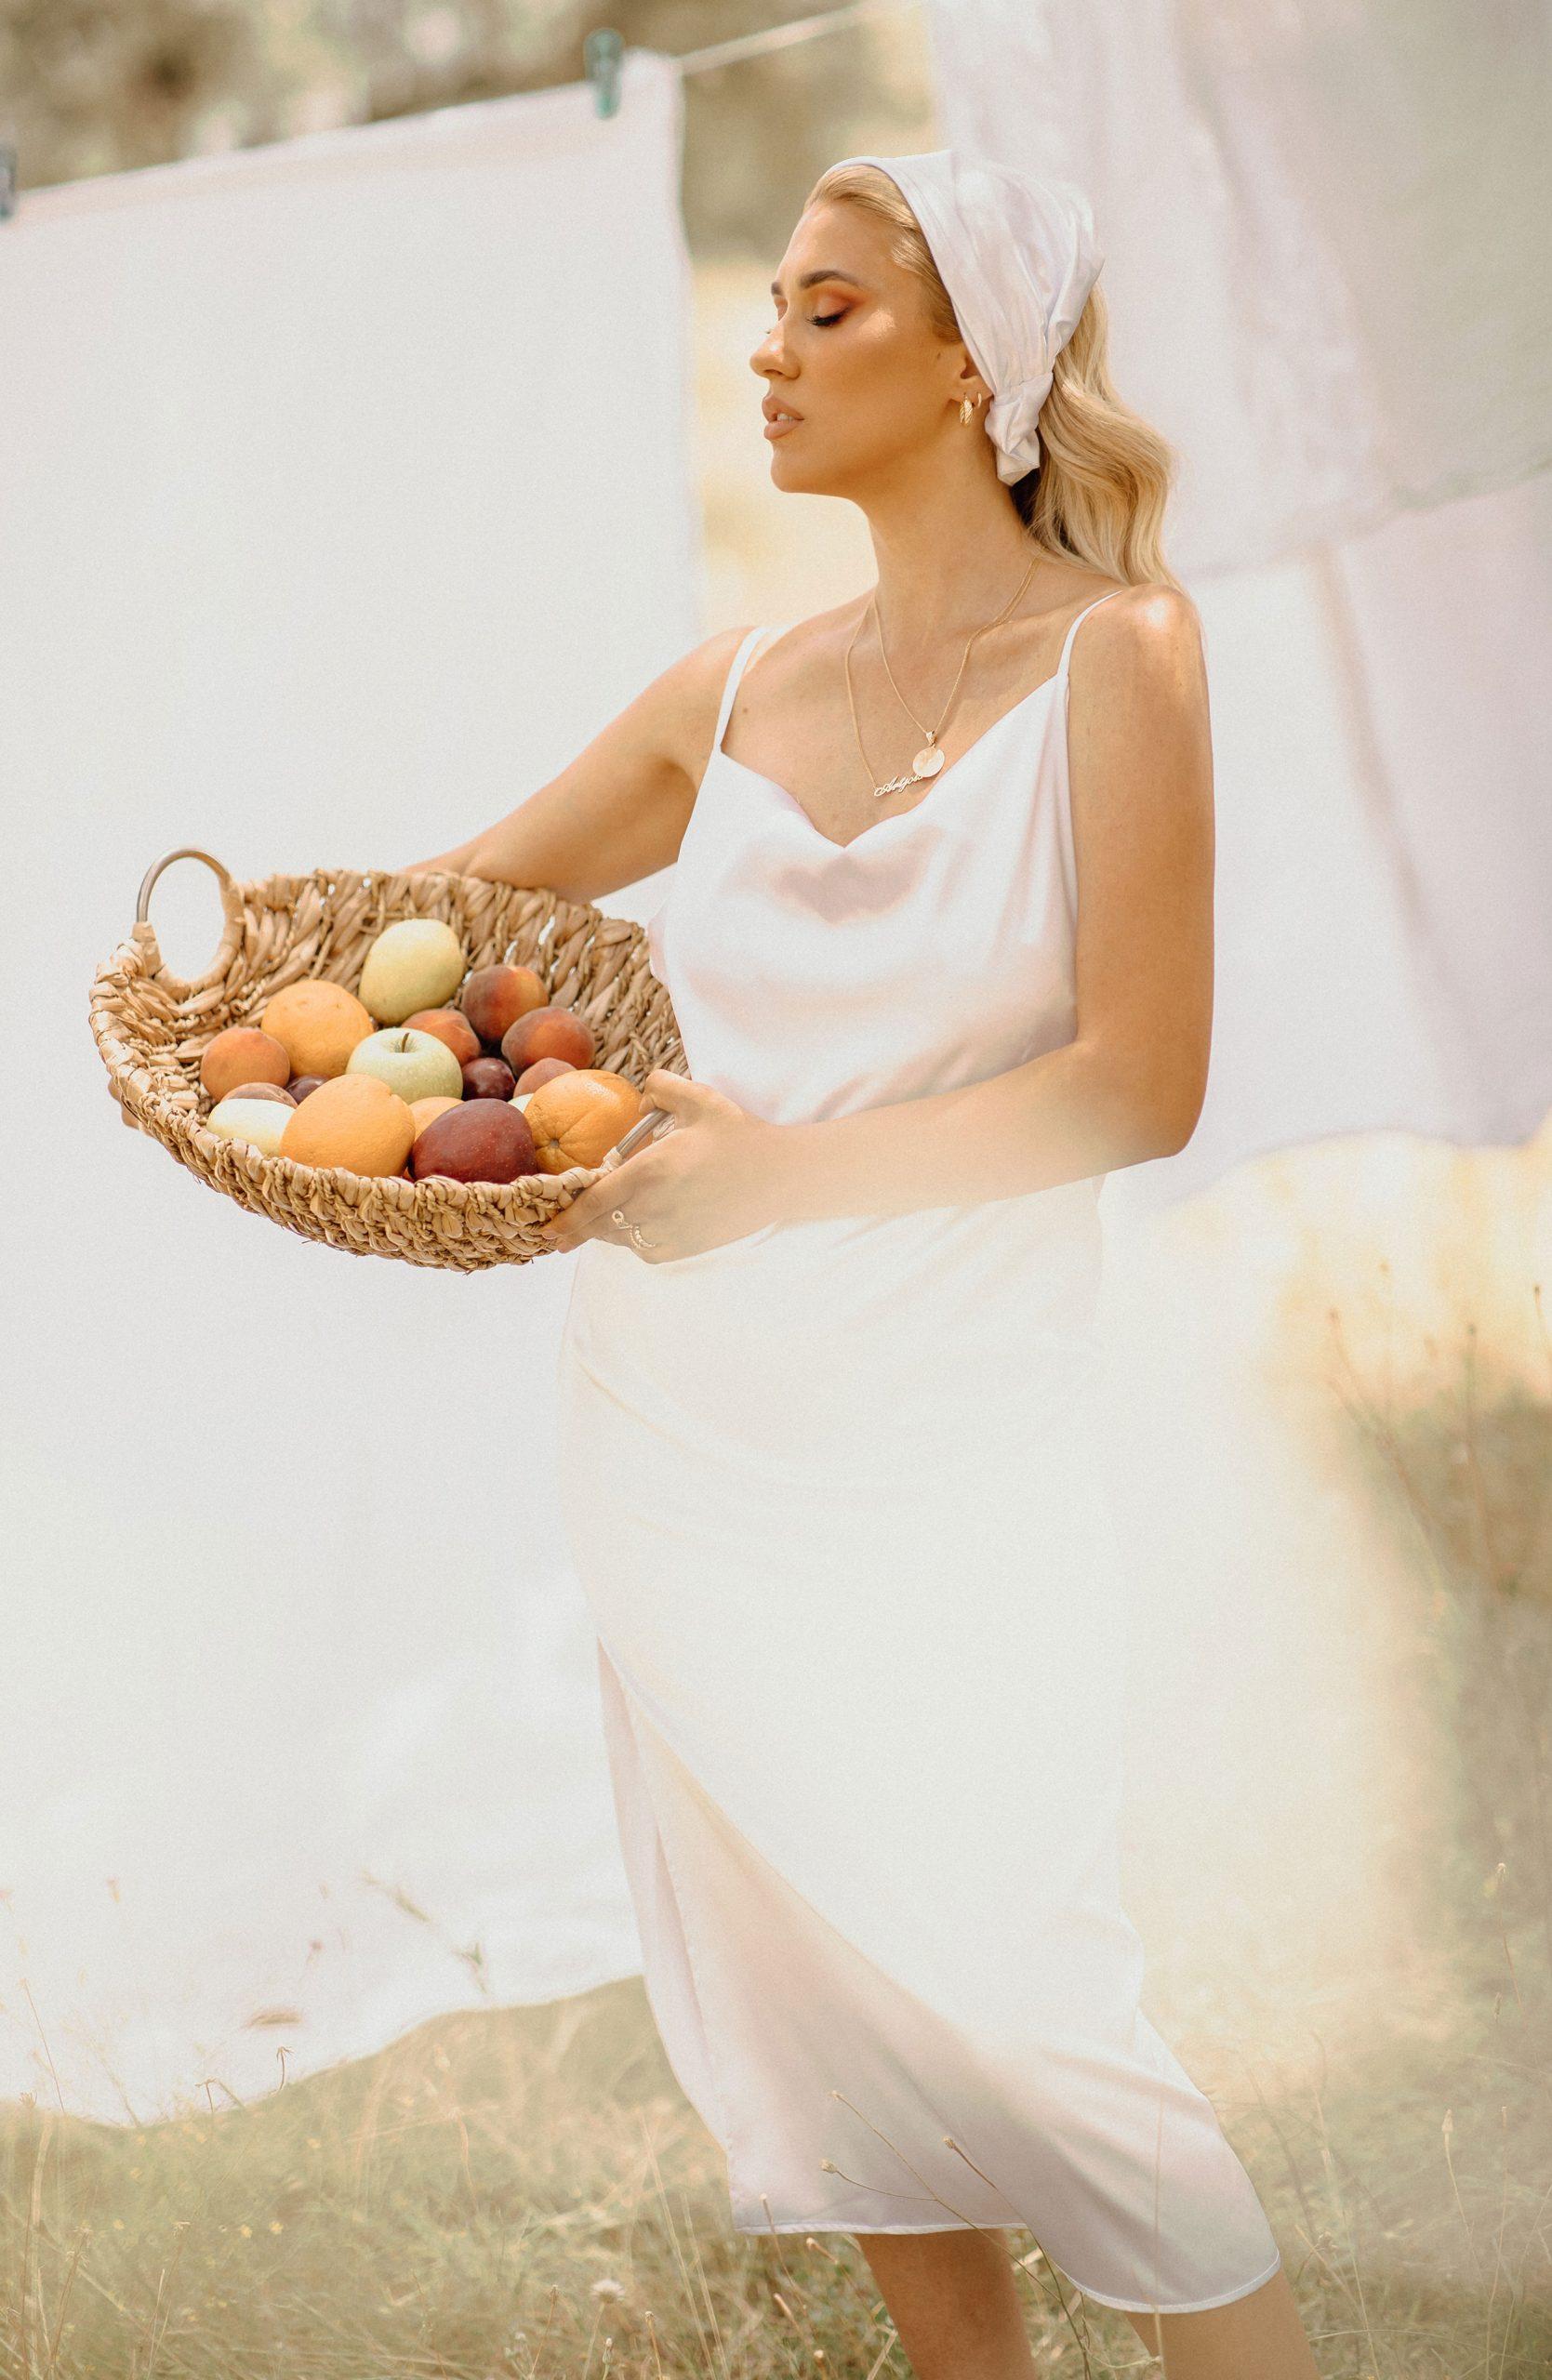 Summer photoshoot in a field wearing white dress